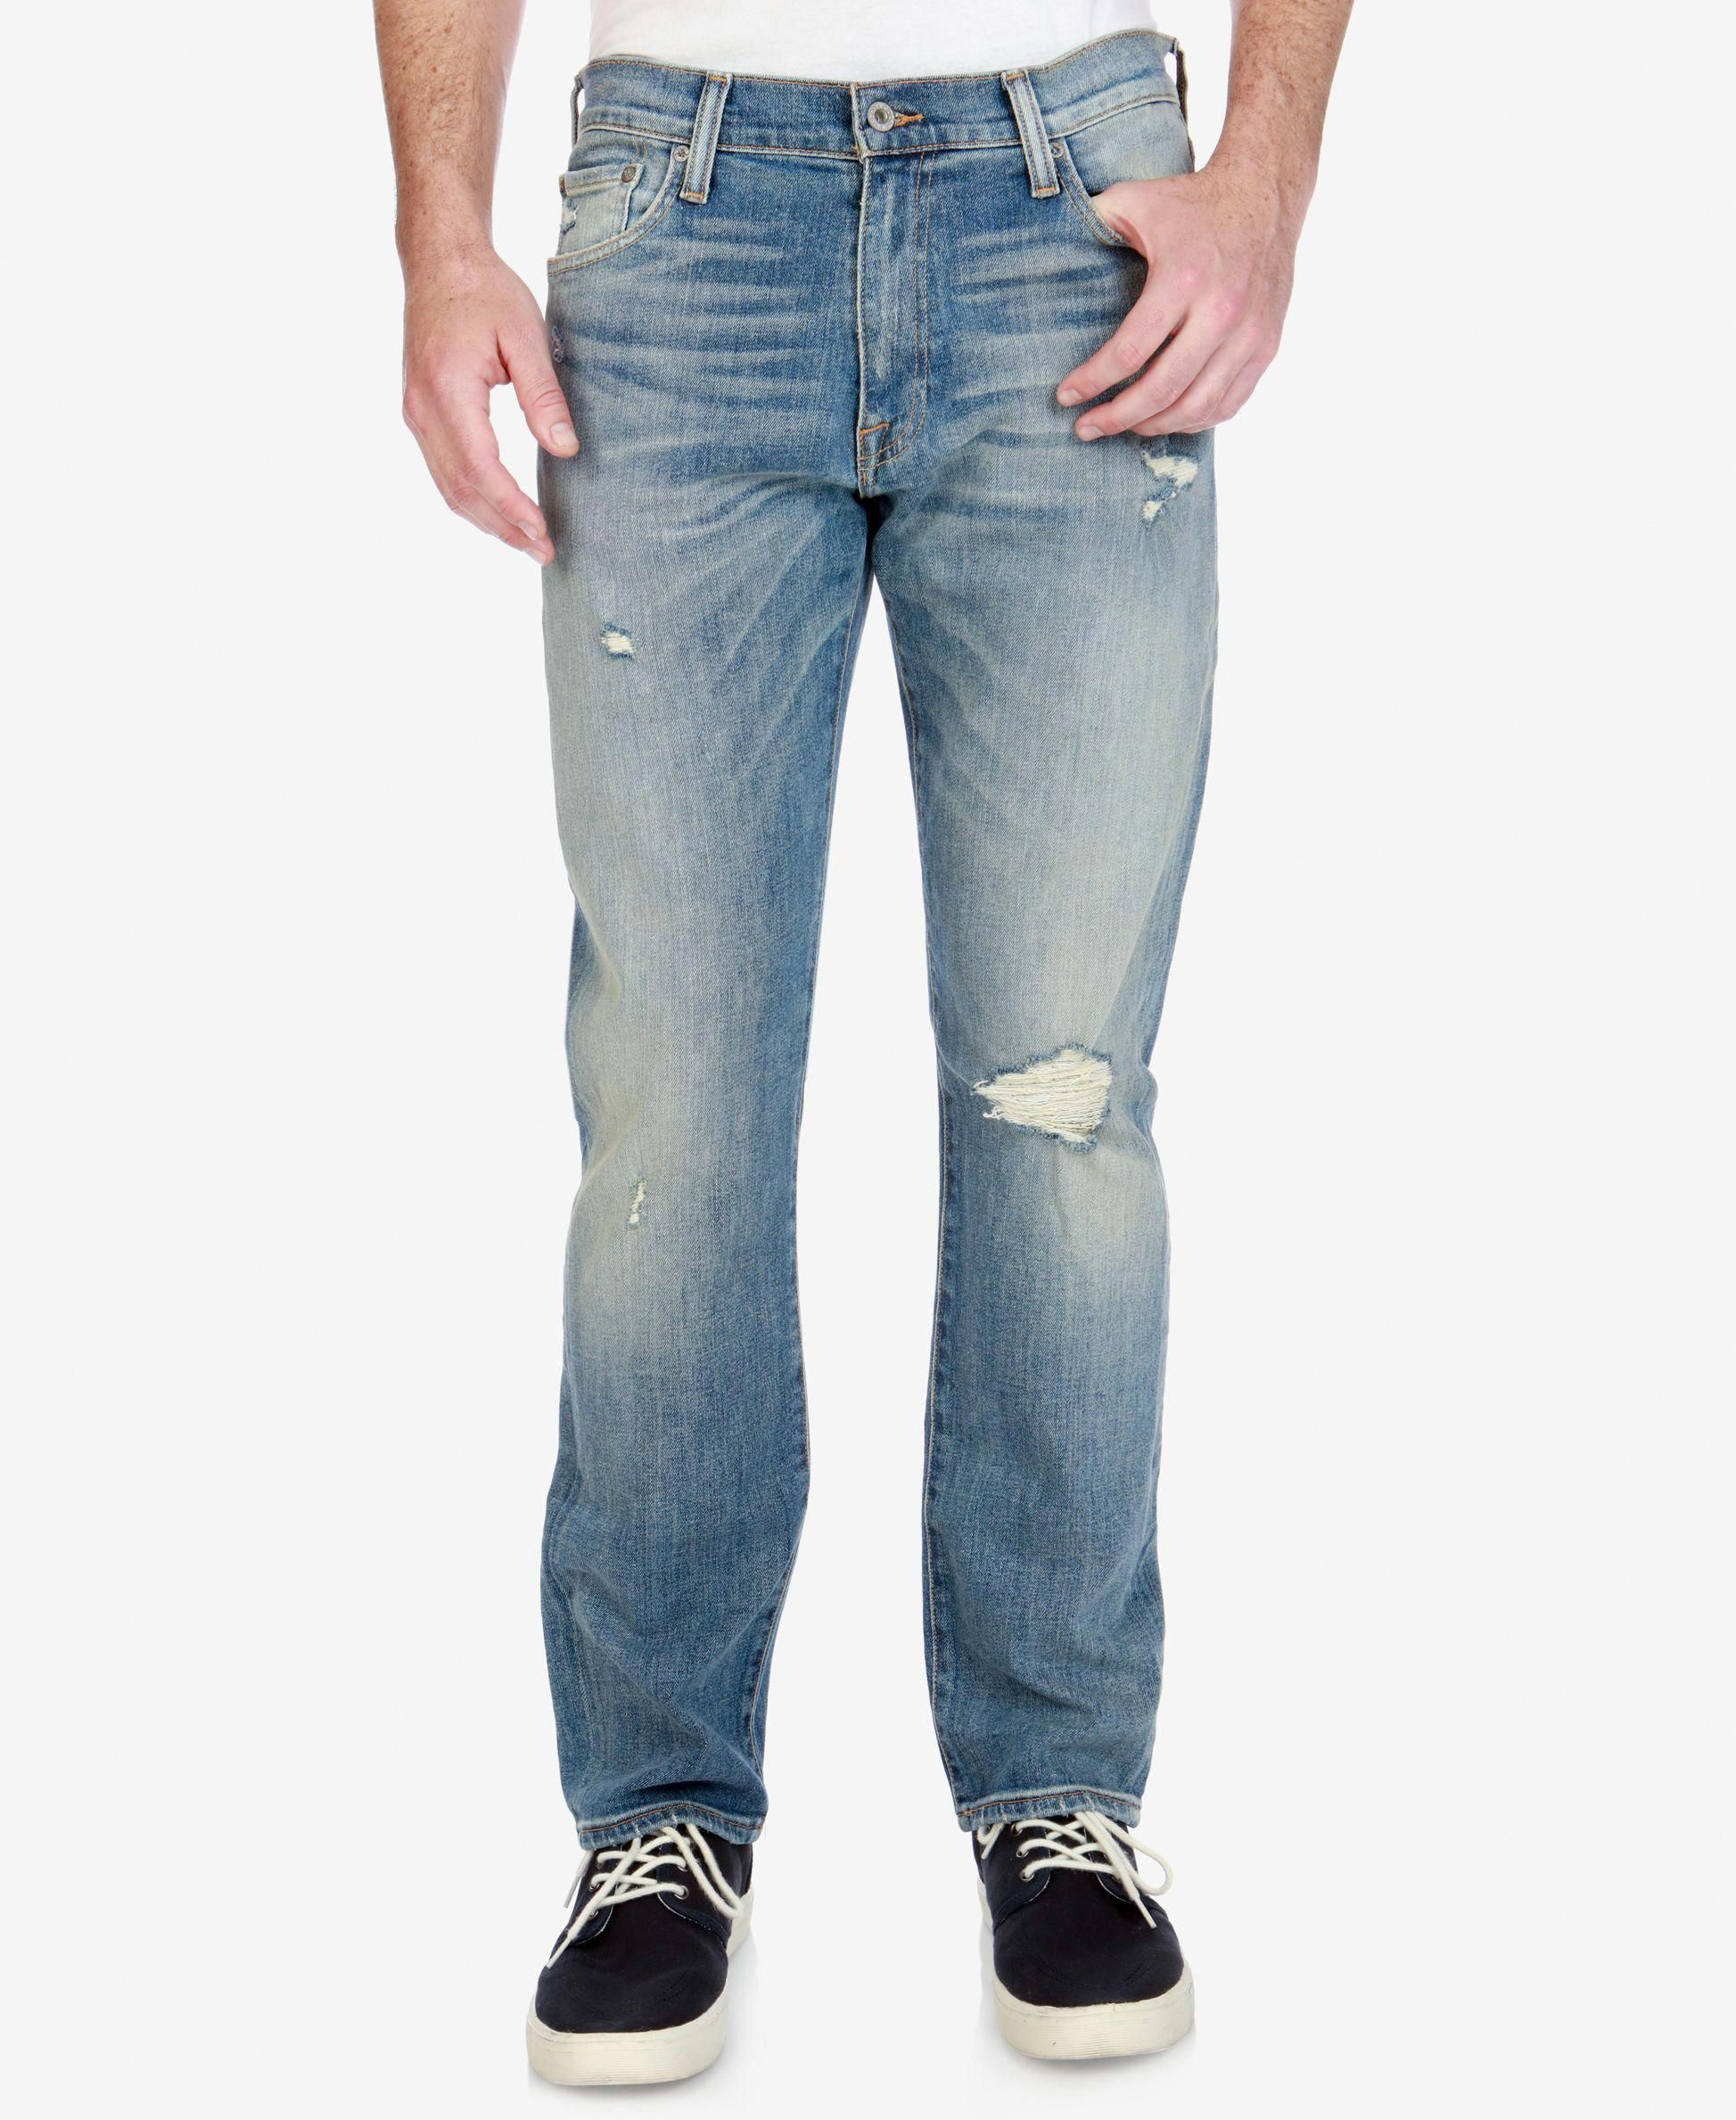 1eb425ffe4be1 Lucky Brand Men s 410 Seven Seas Athletic-Fit Denim Jeans  MensJeans ...